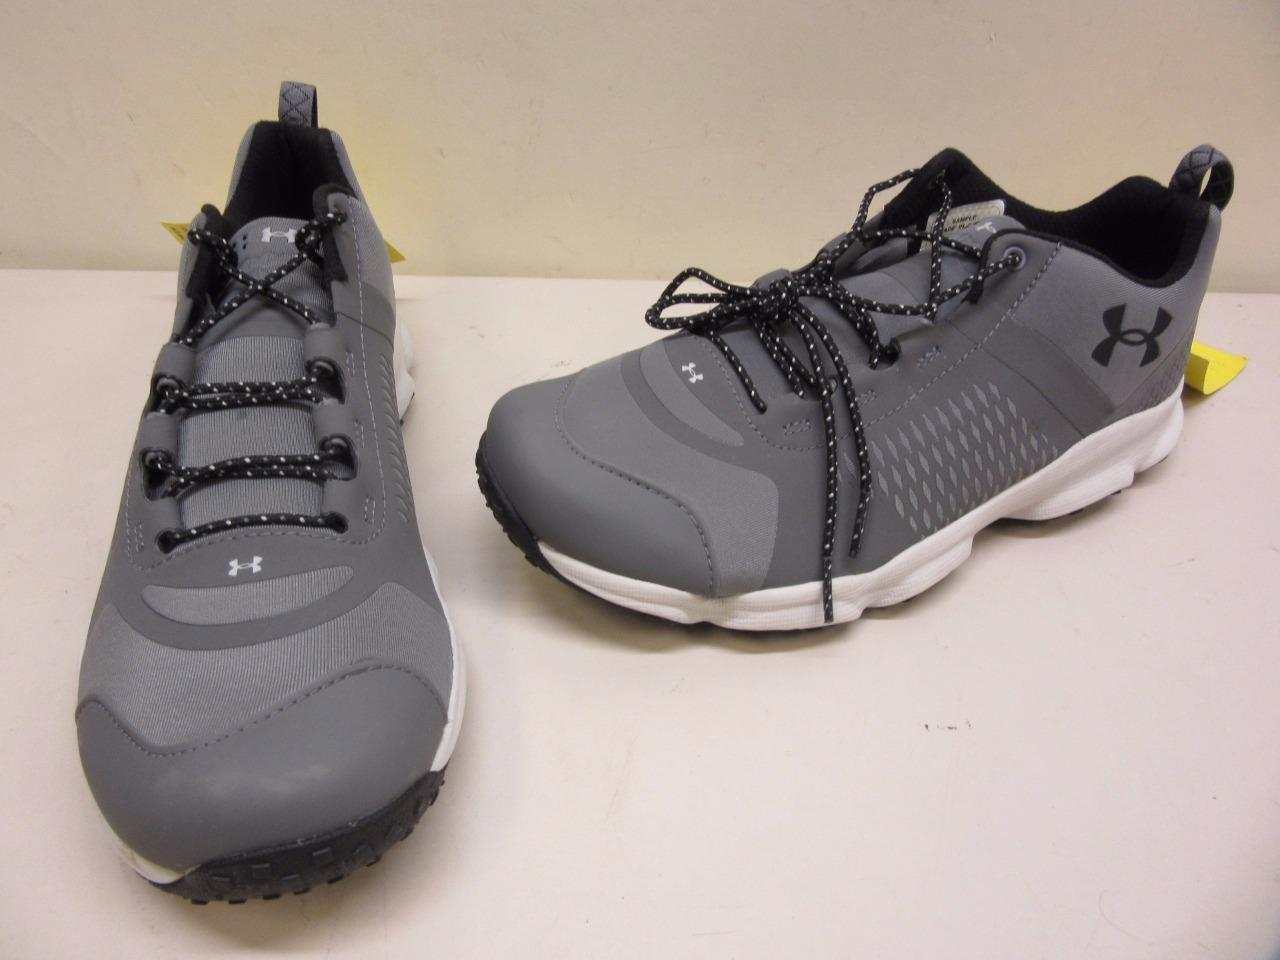 Under Armour Speedfit Hiker Low Uomo Size 9 US Shoe Grigio ~SMS Samples